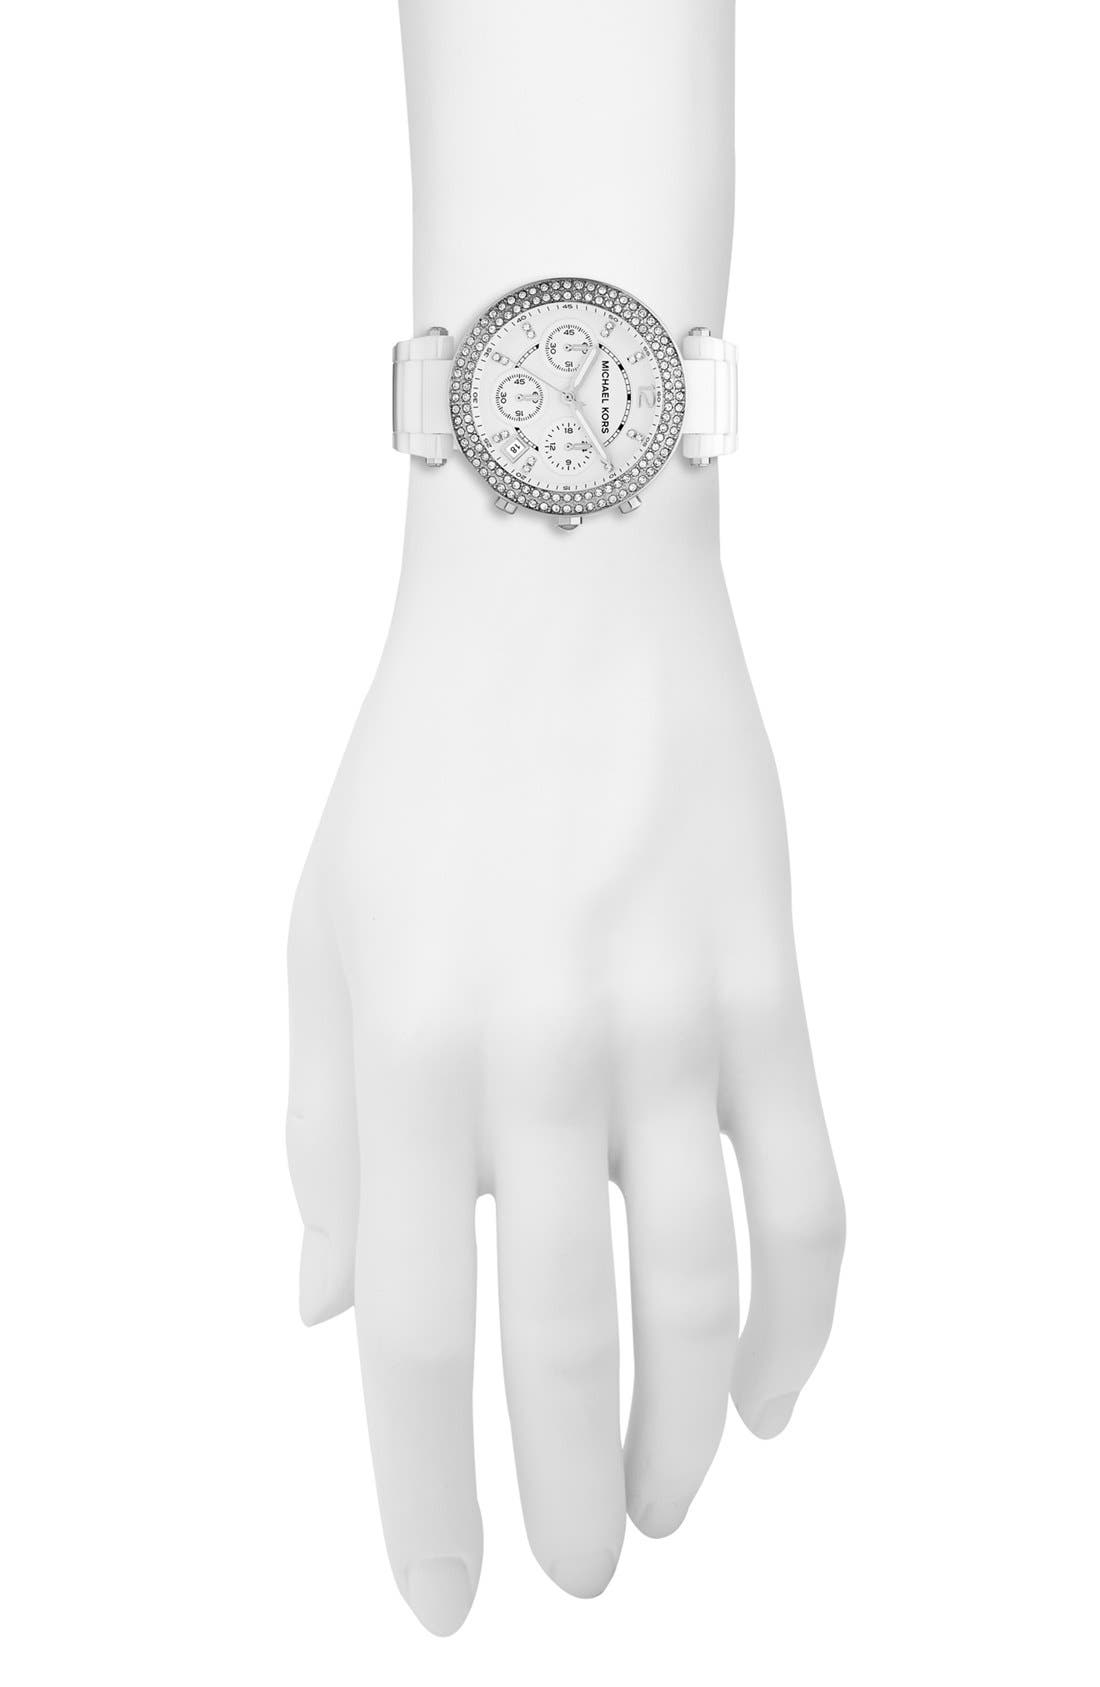 Alternate Image 2  - Michael Kors 'Parker' Chronograph Ceramic Bracelet Watch, 39mm